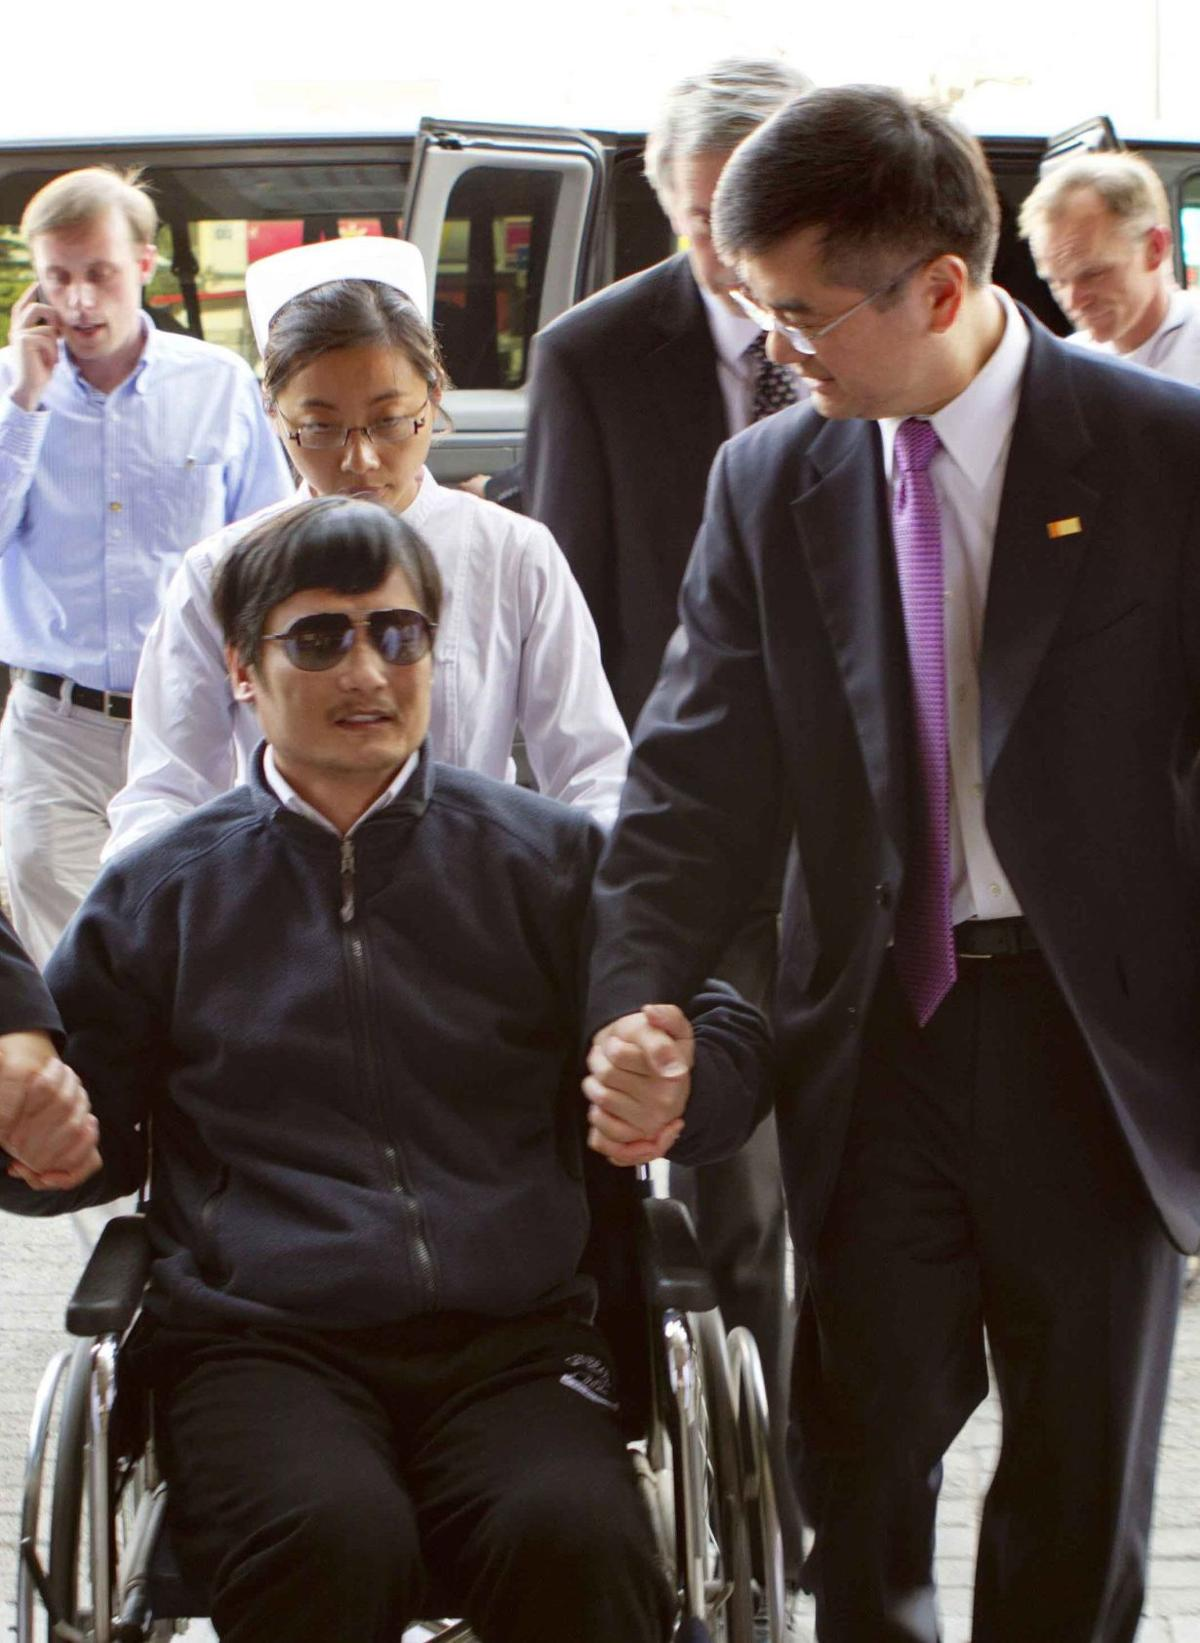 Friend: Dissident left embassy after threats